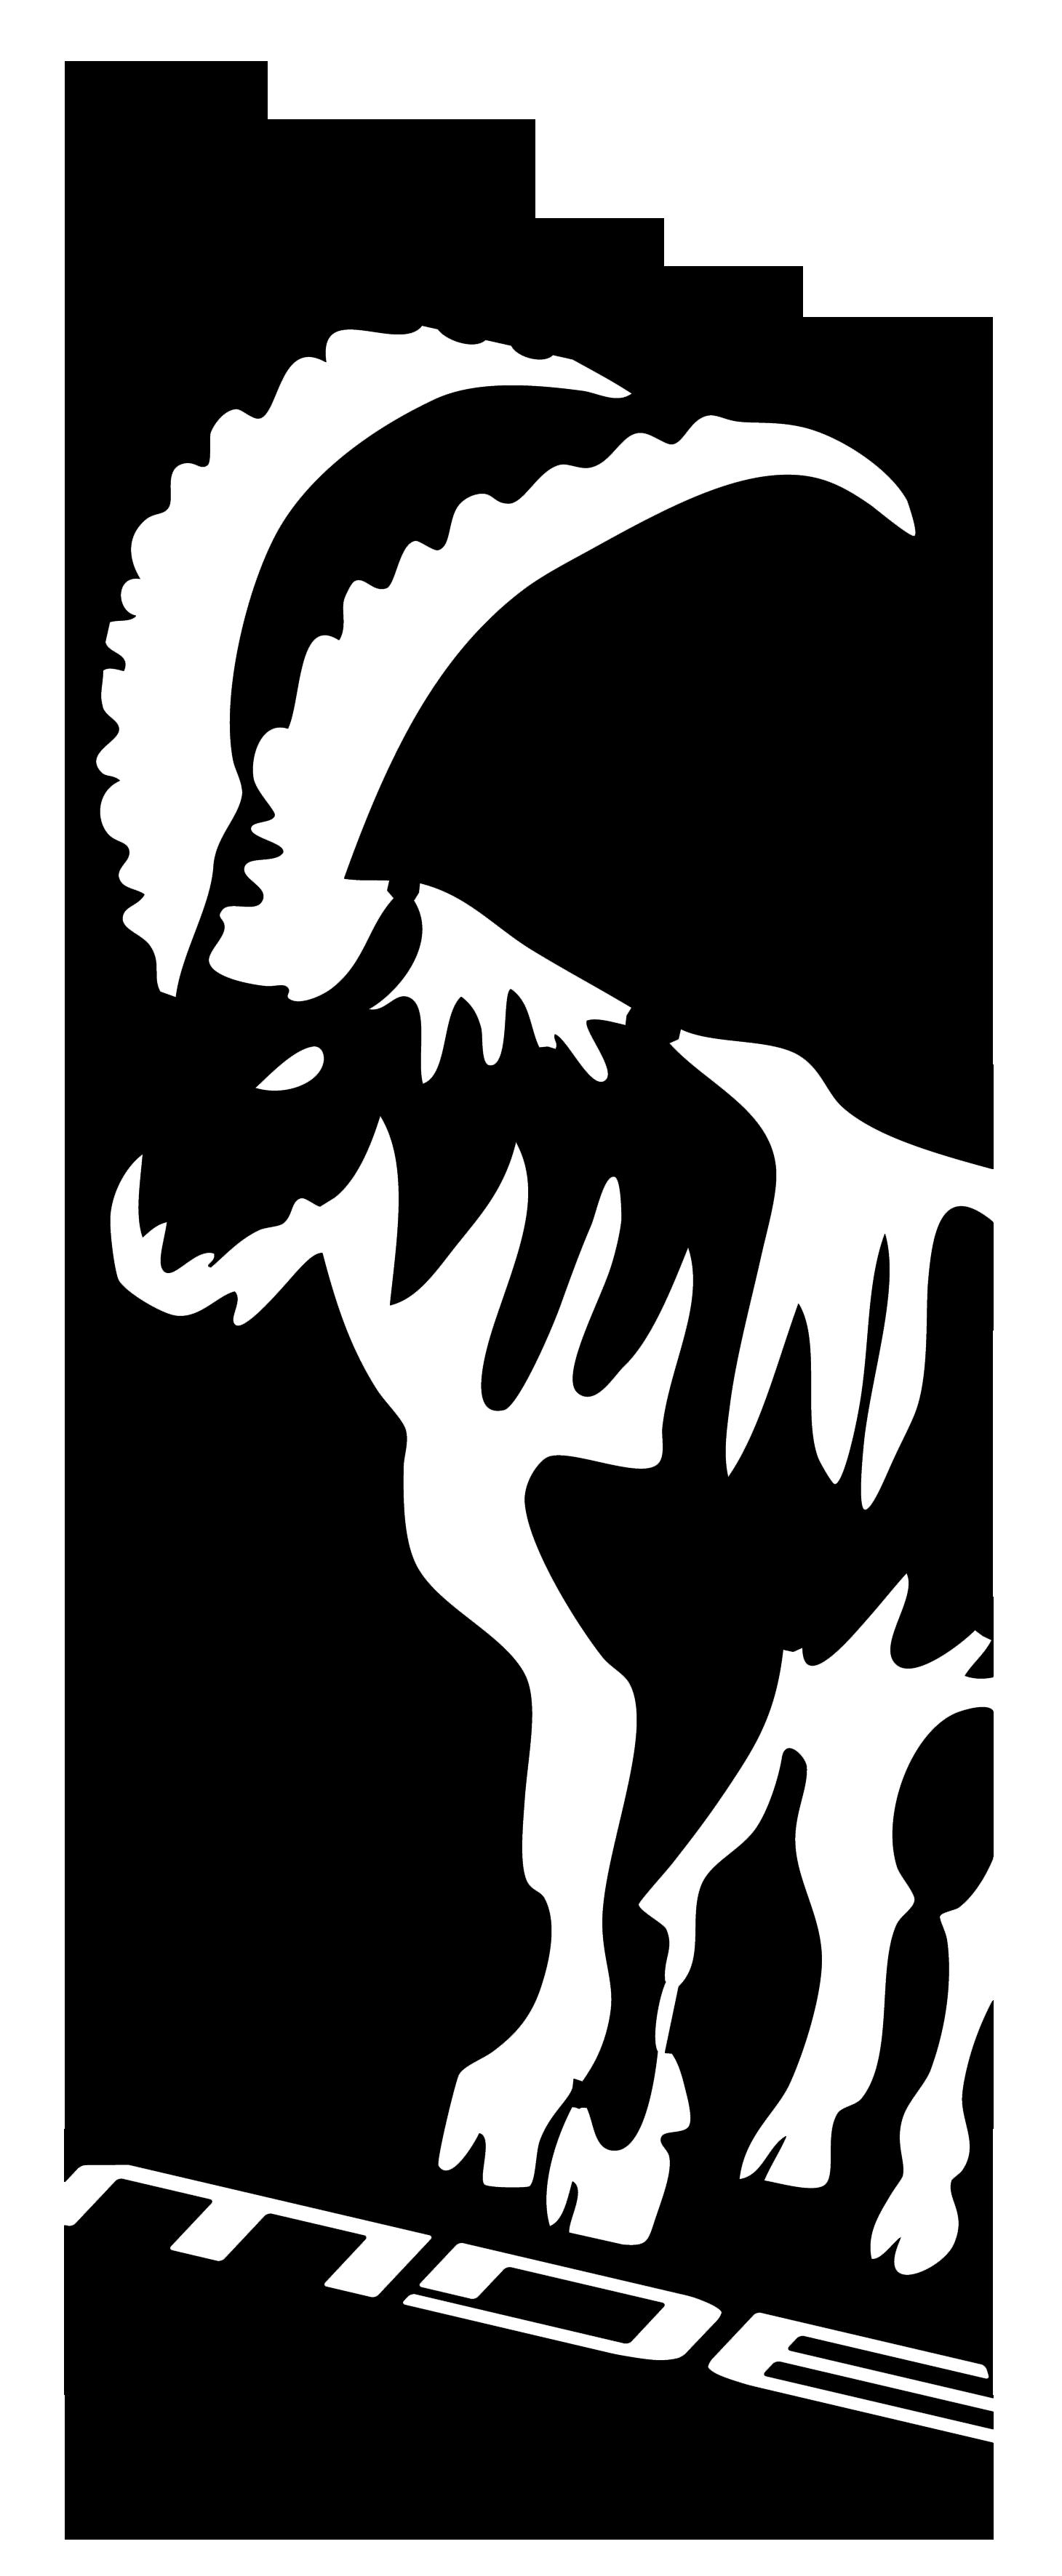 mde_damper_650b_2014_logo_capra